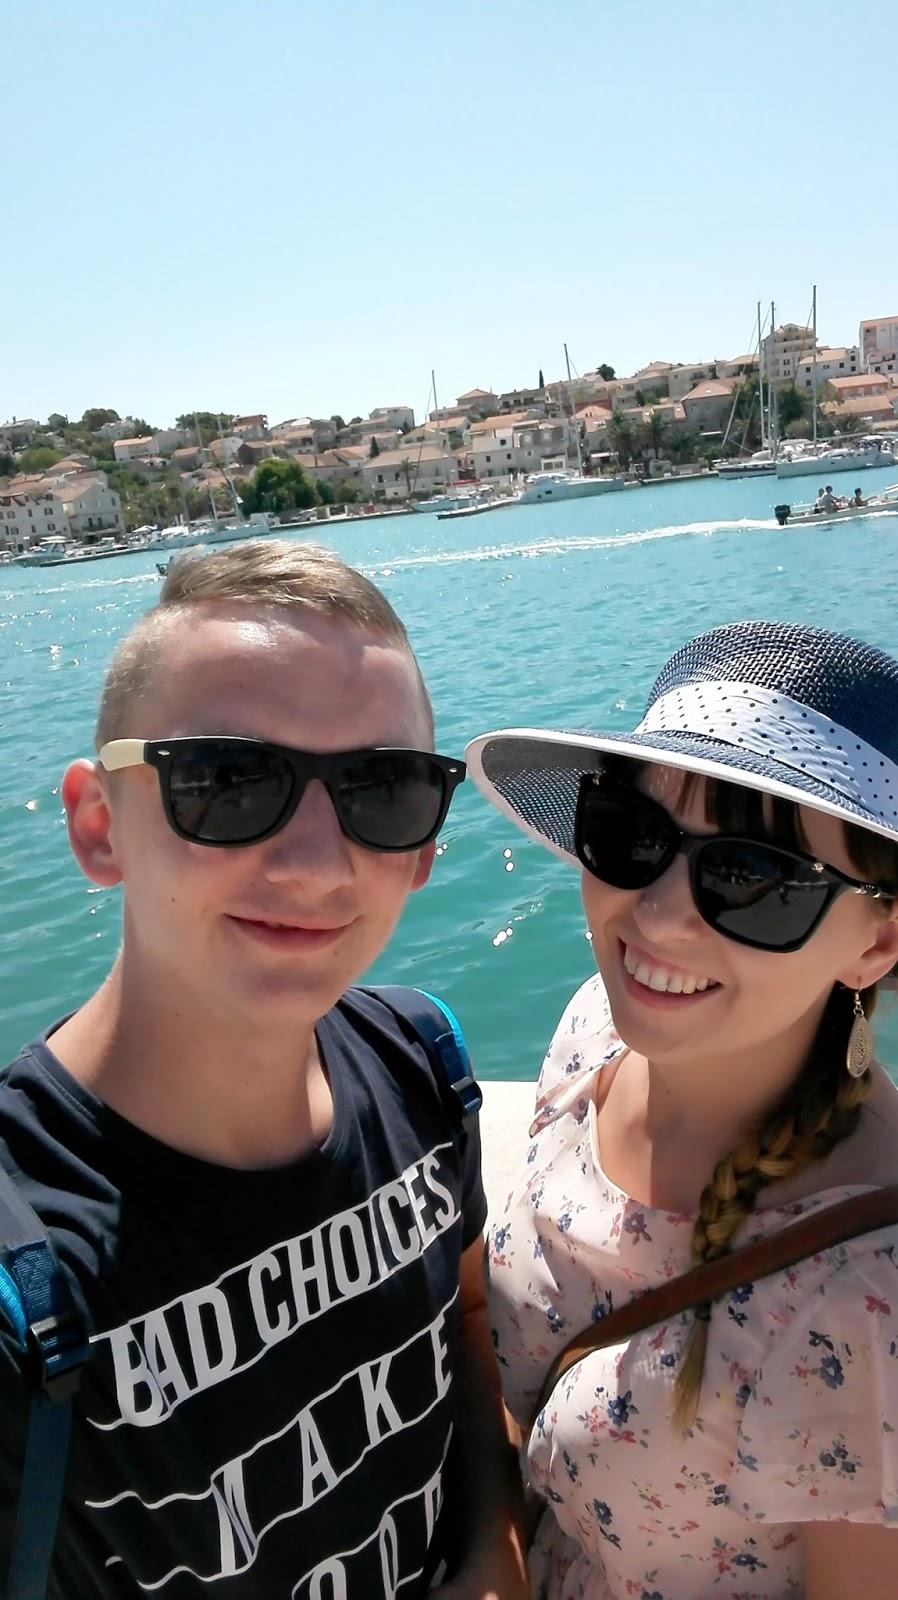 Bośniacka kultura randkowa